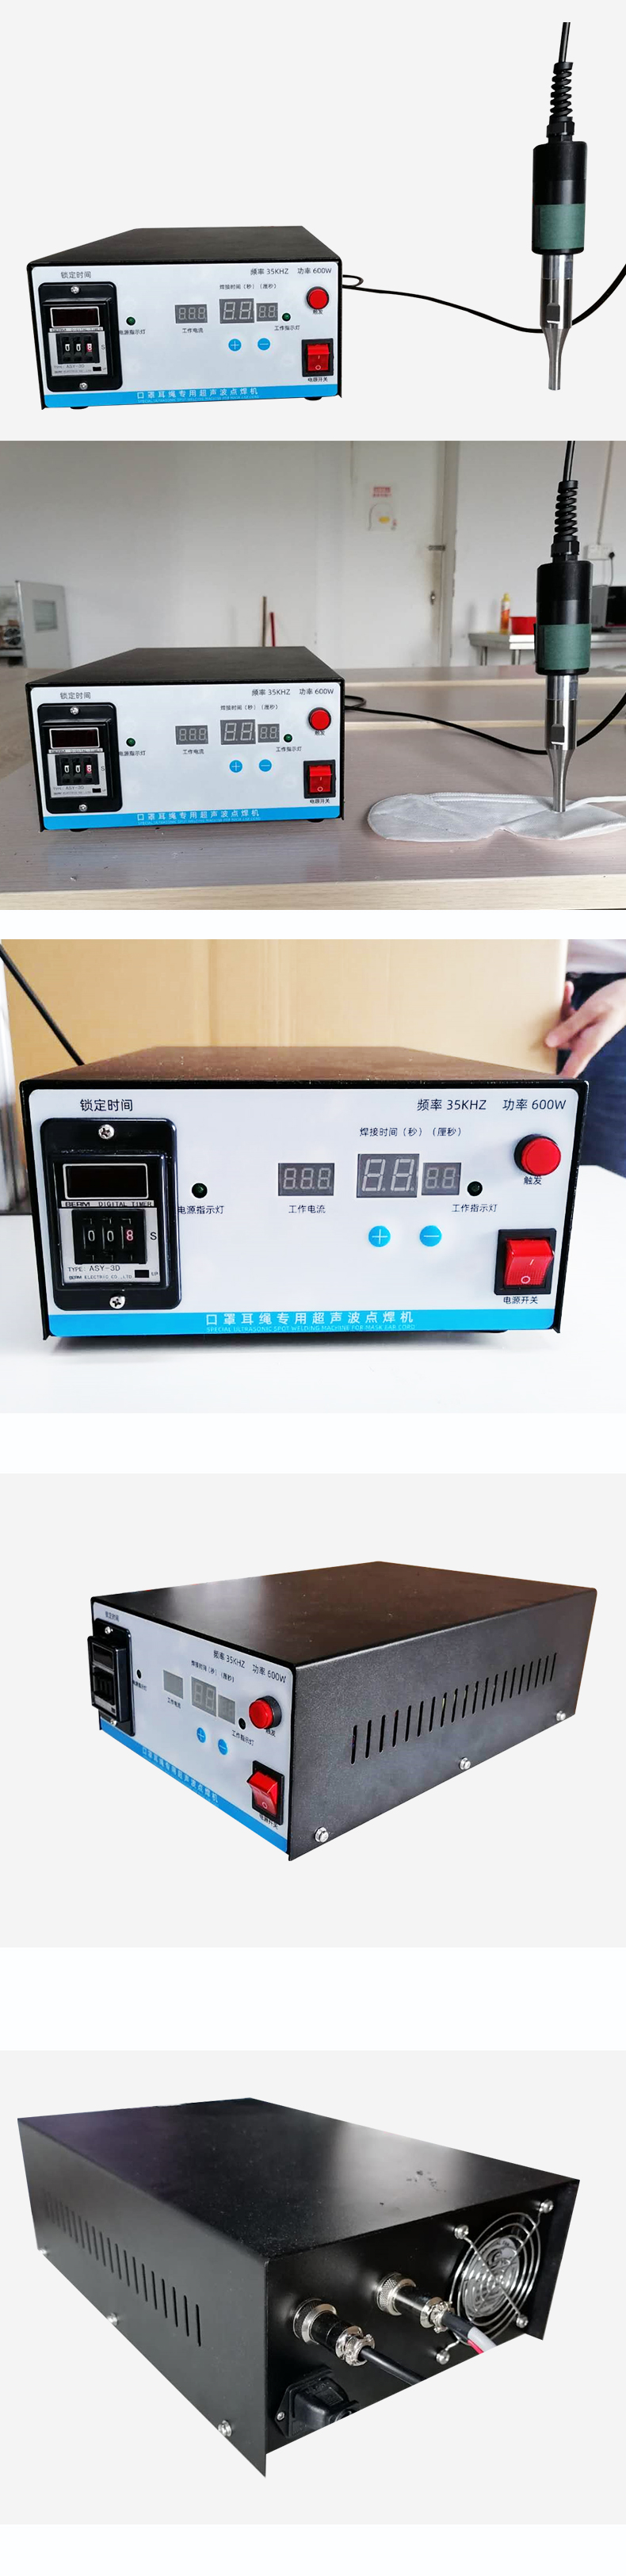 28KHZ Handheld 800W Ultrasonic Plastic Welding Machine for Riveting And Welding 7